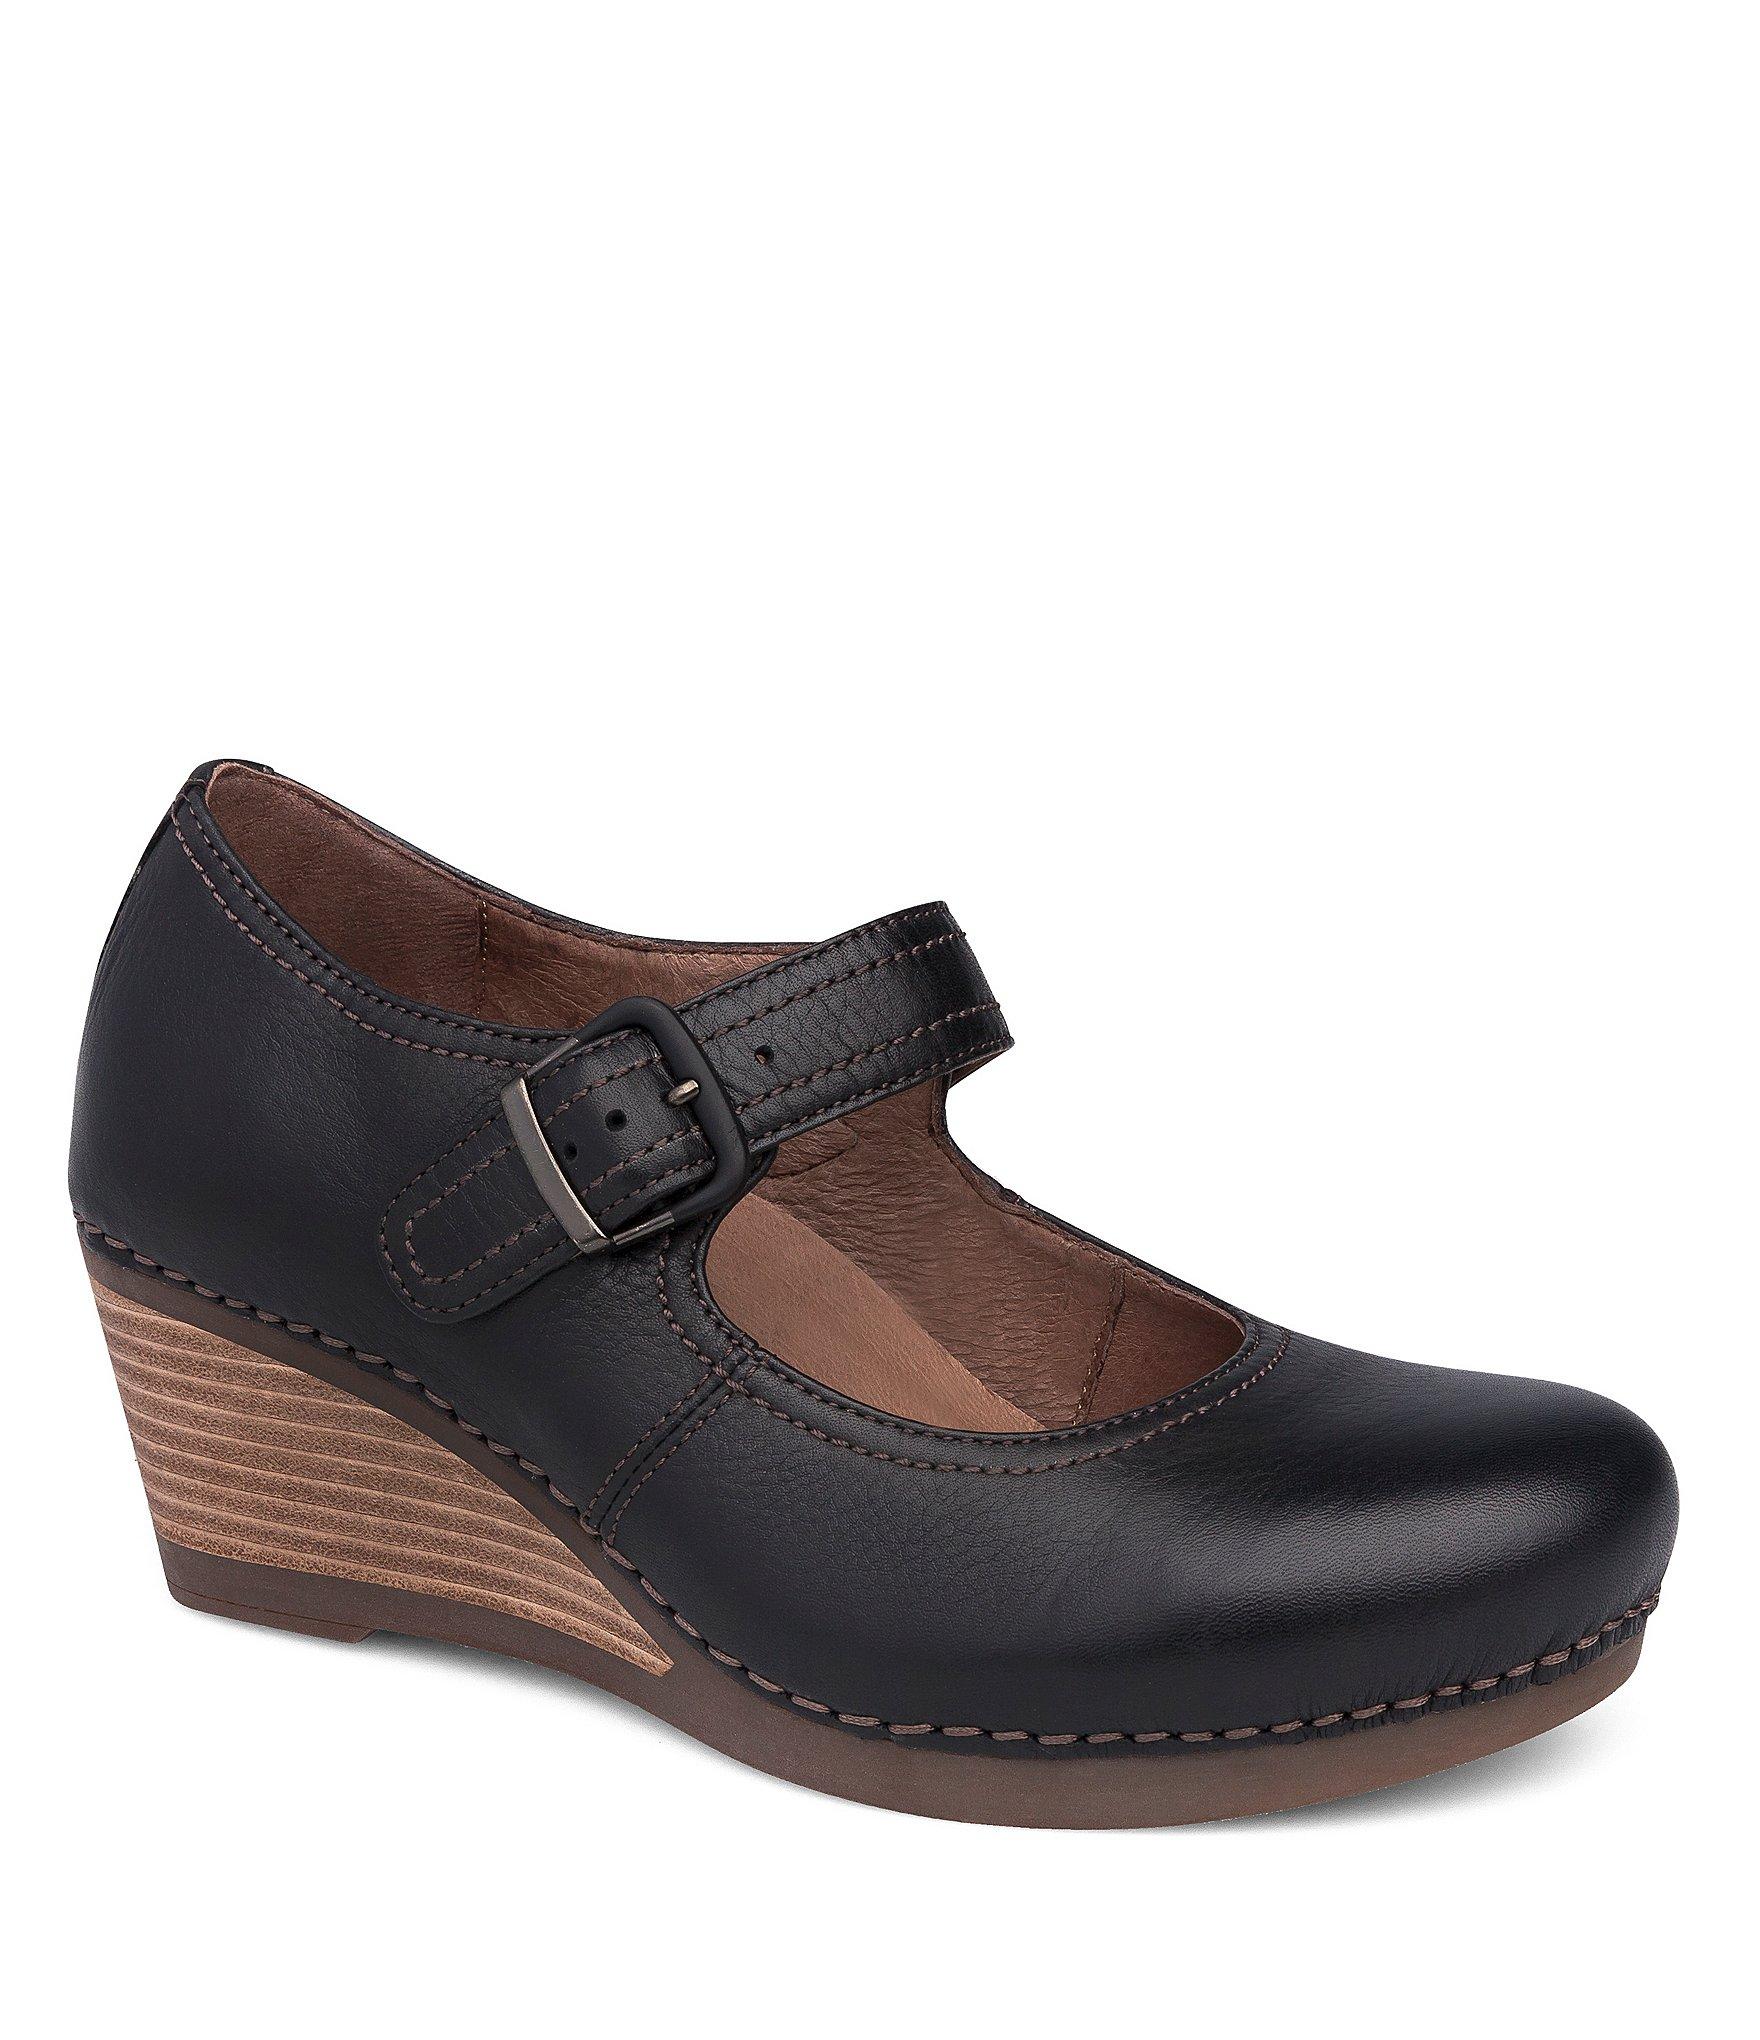 Dansko Shoes Sale Canada